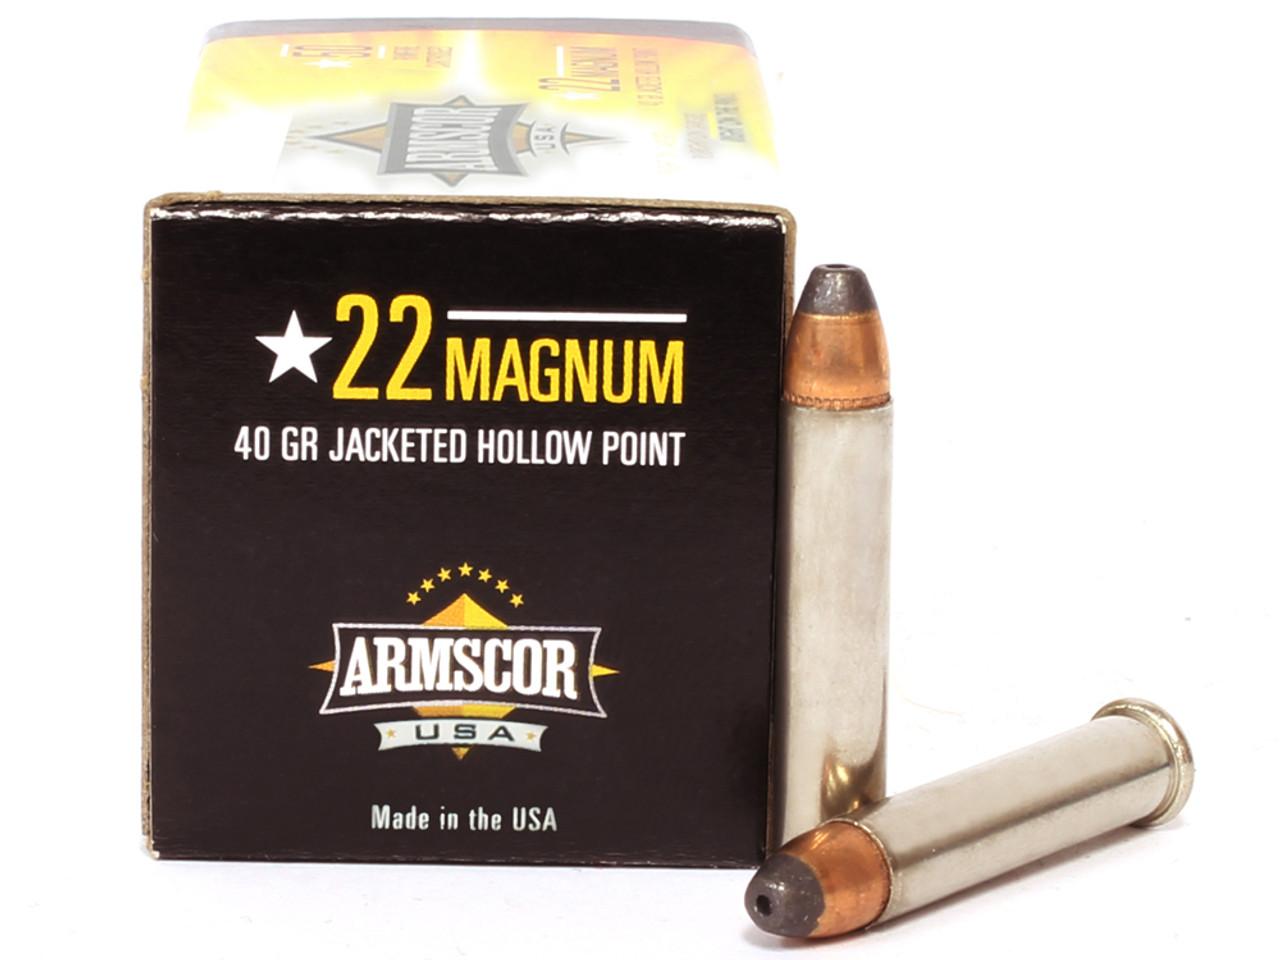 22 magnum 40 grain jhp armscor usa ammunition for sale in stock